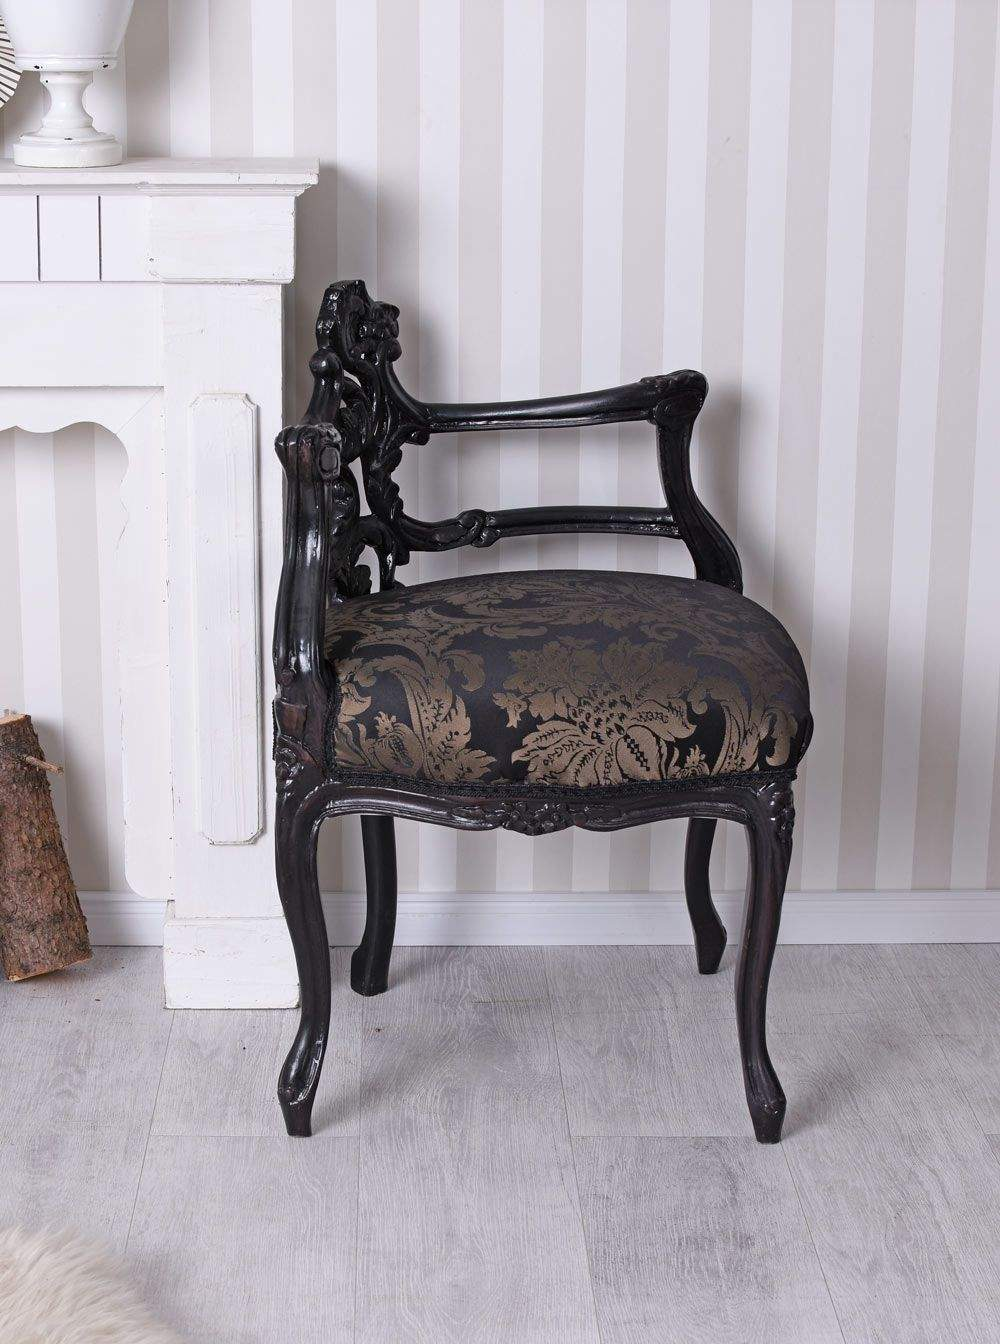 stuhl antik ebay kleinanzeigen eckstuhl antik lehnstuhl schminktisch hocker polsterstuhl stuhl neu